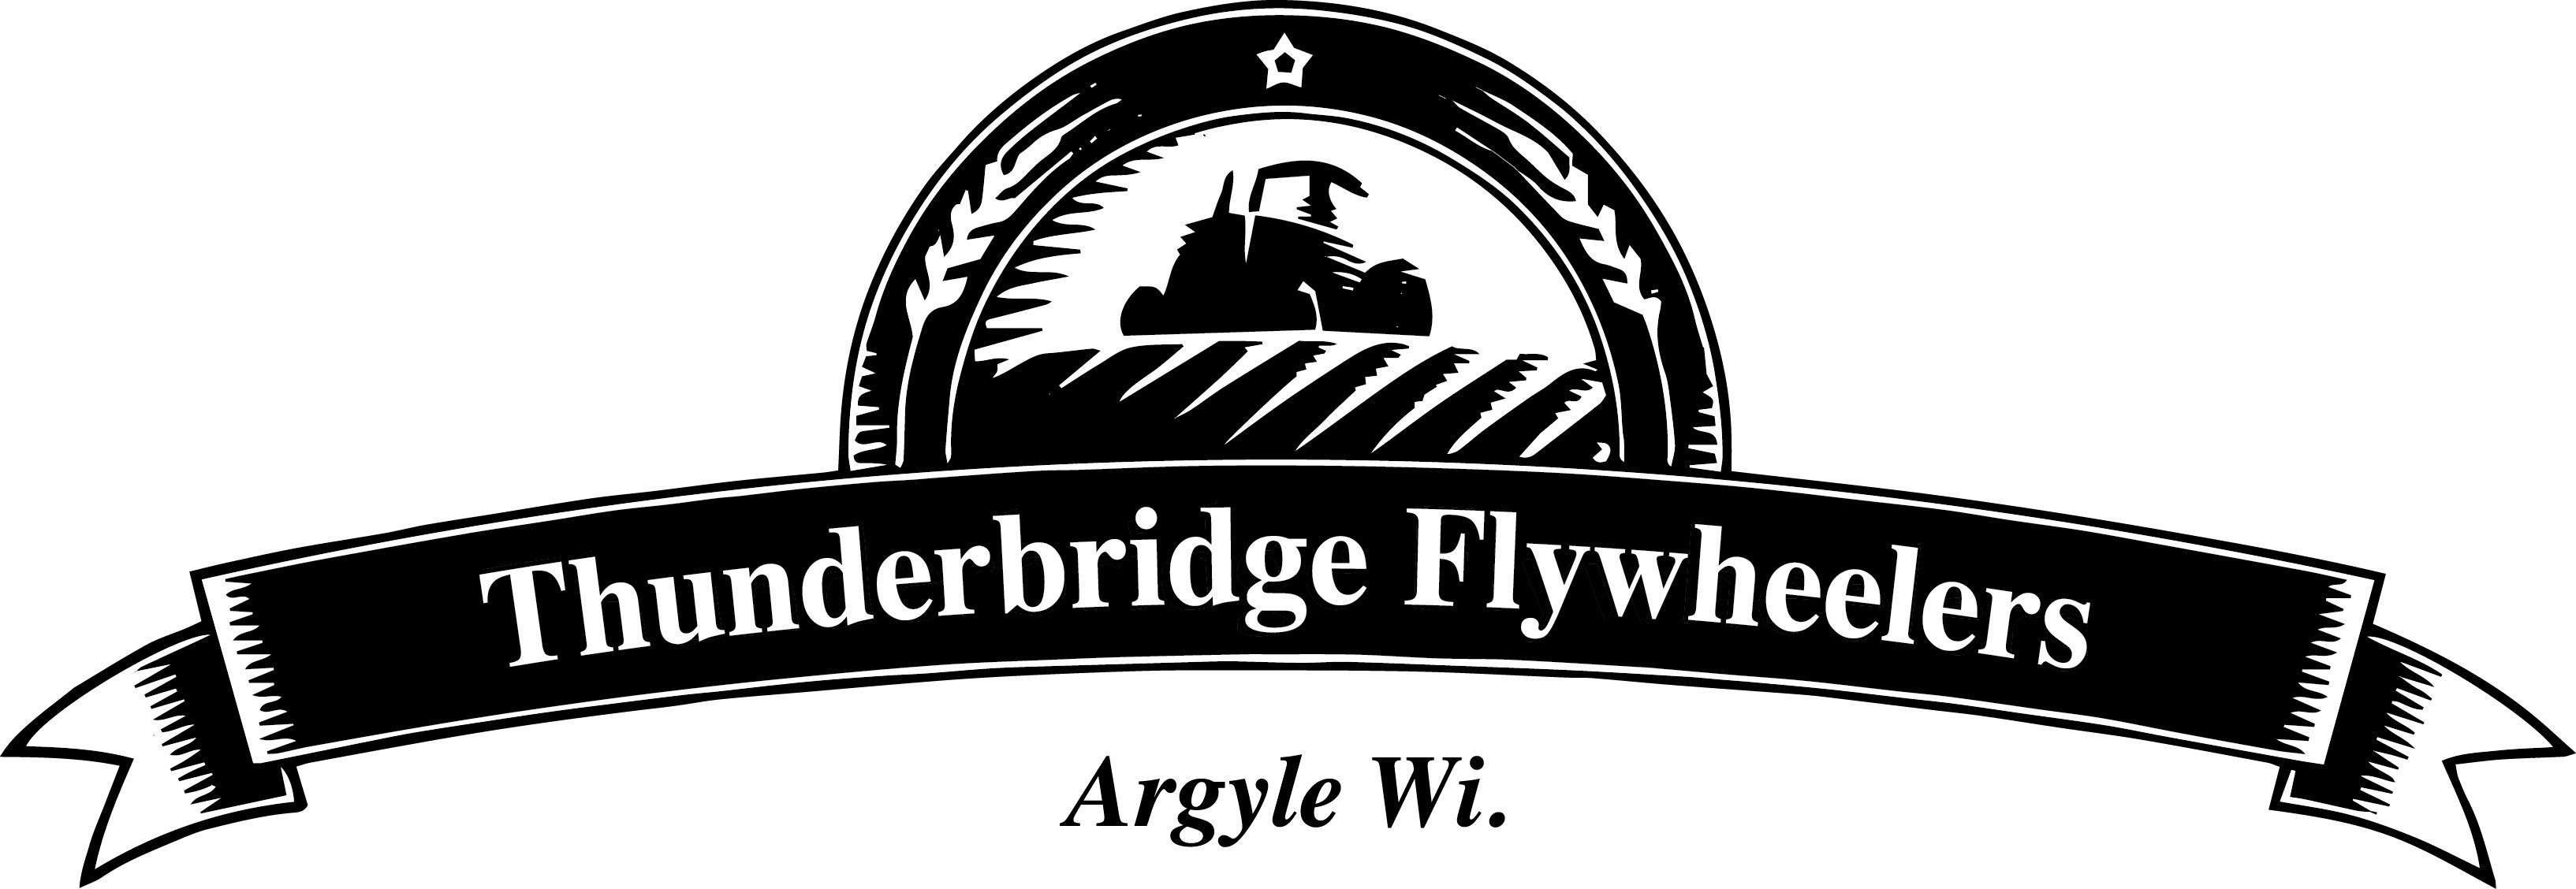 thunderbridge-flywheelers